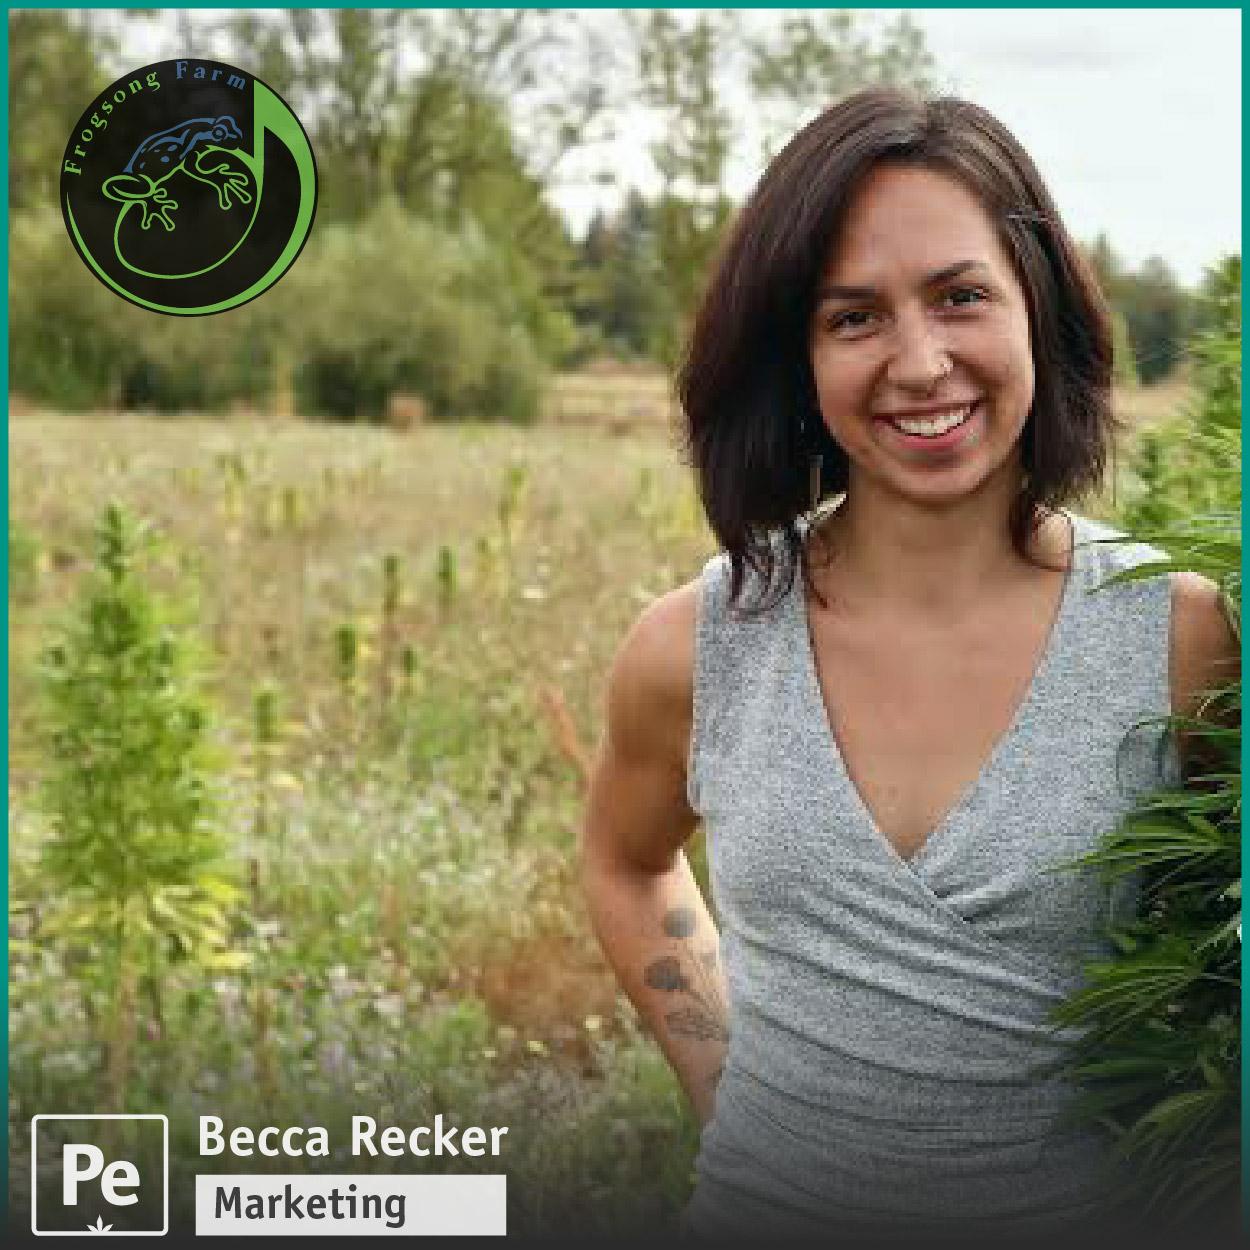 Becca Recker, Marketing Lead for Frog Song Farms, a craft hemp CBD grower in Oregon